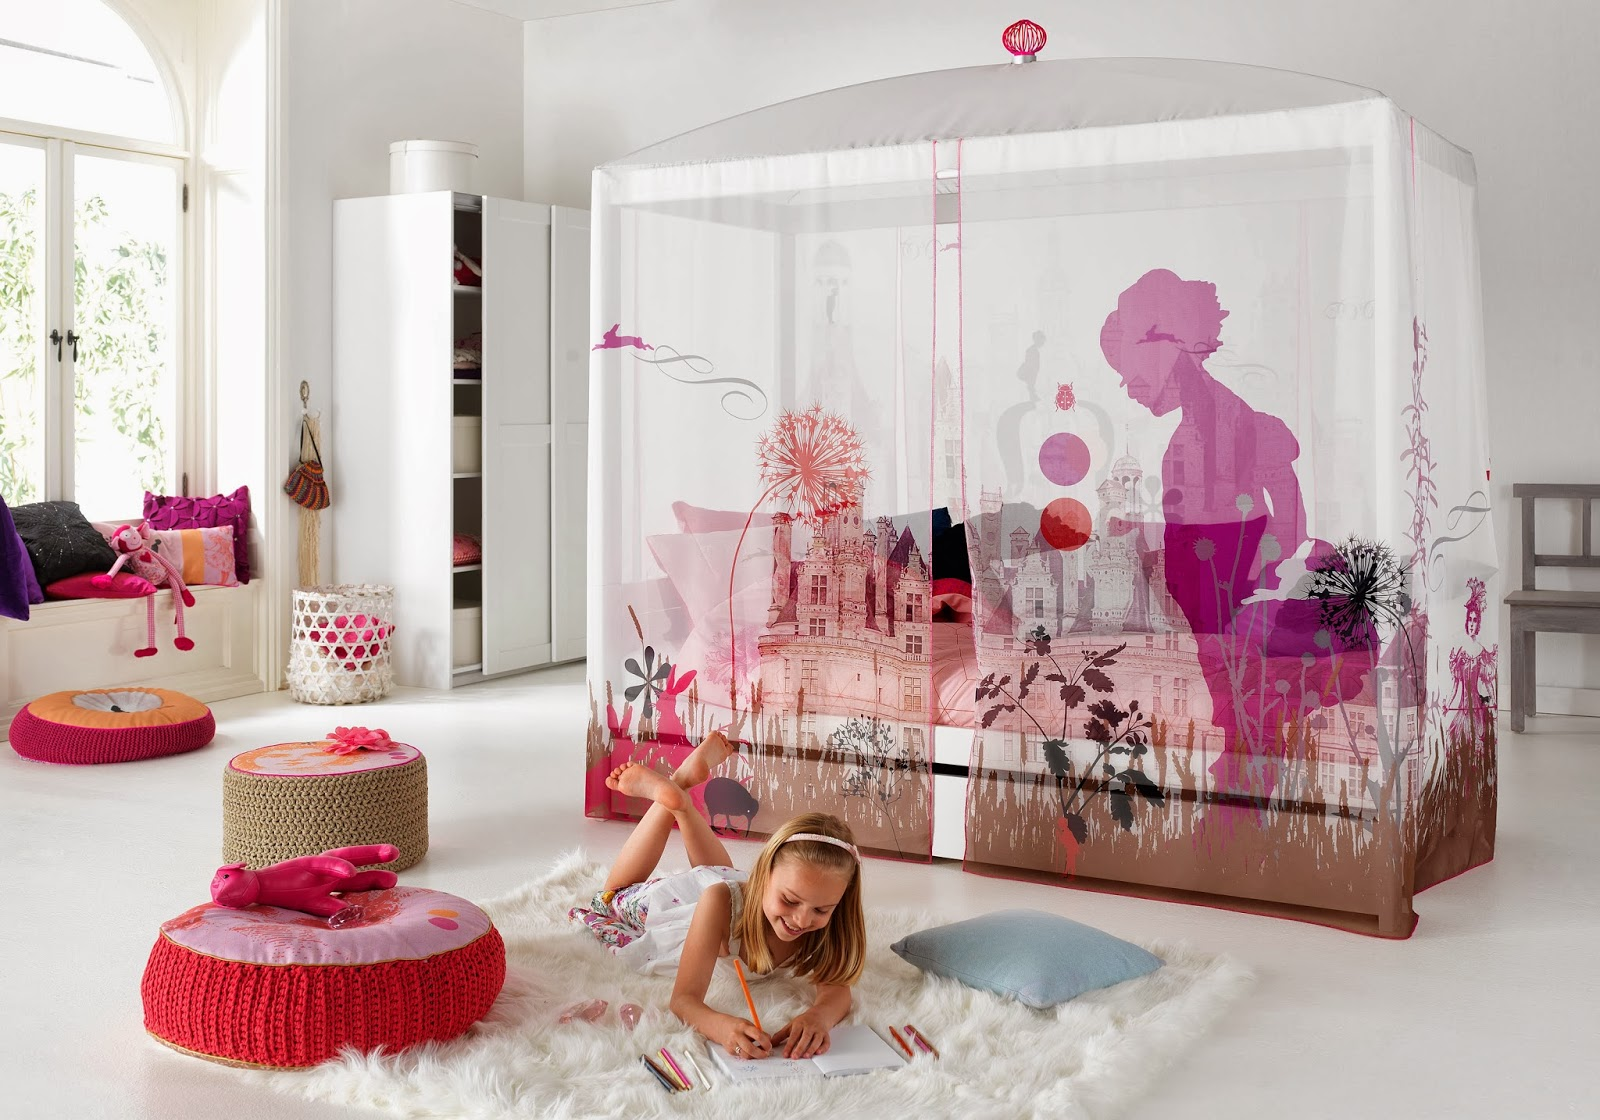 http://www.portobellostreet.es/mueble/27816/Cama-Infantil-Wonderland